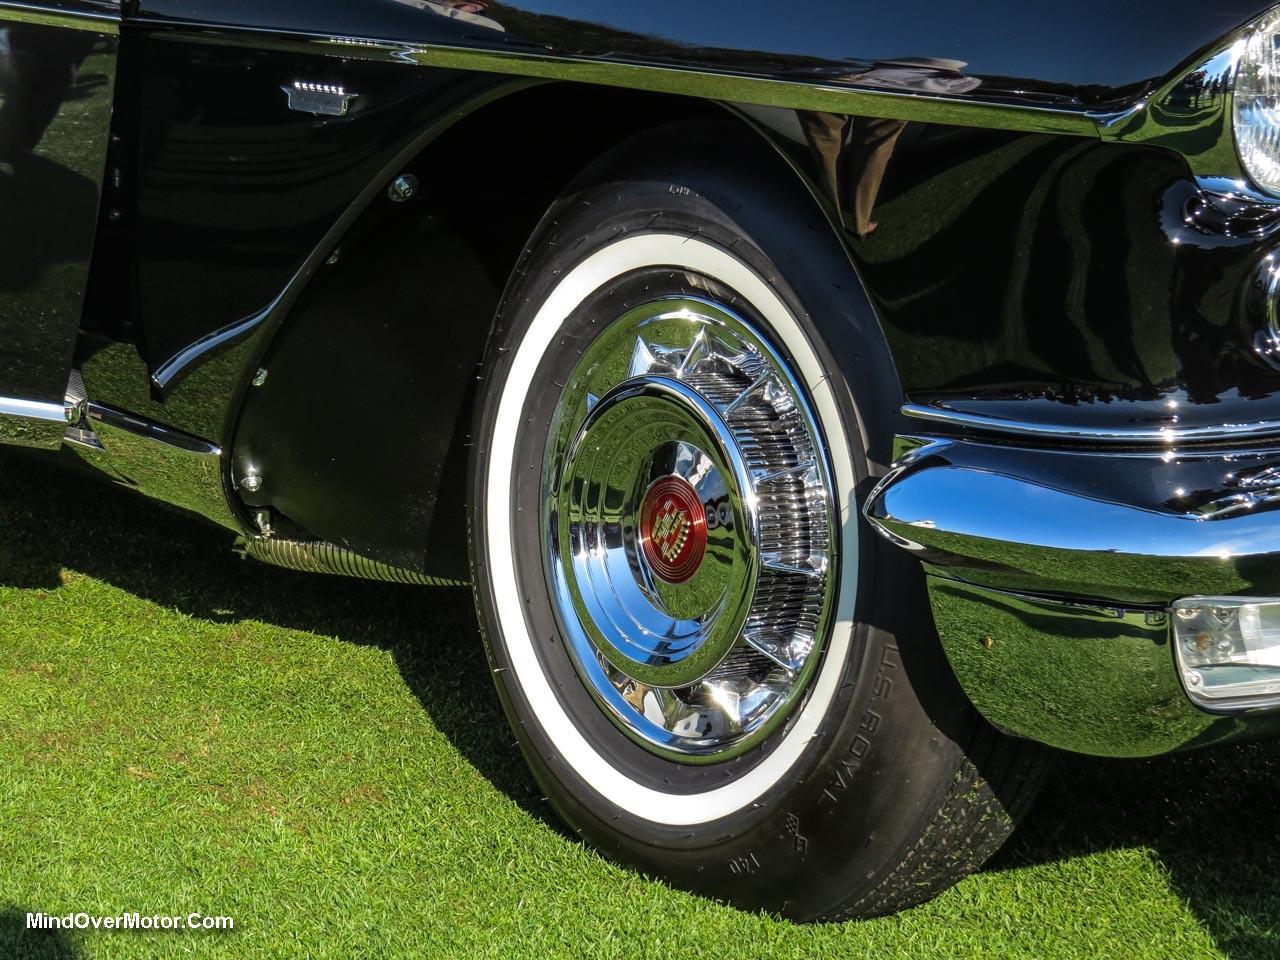 1957 Cadillac Eldorado Brougham Rim